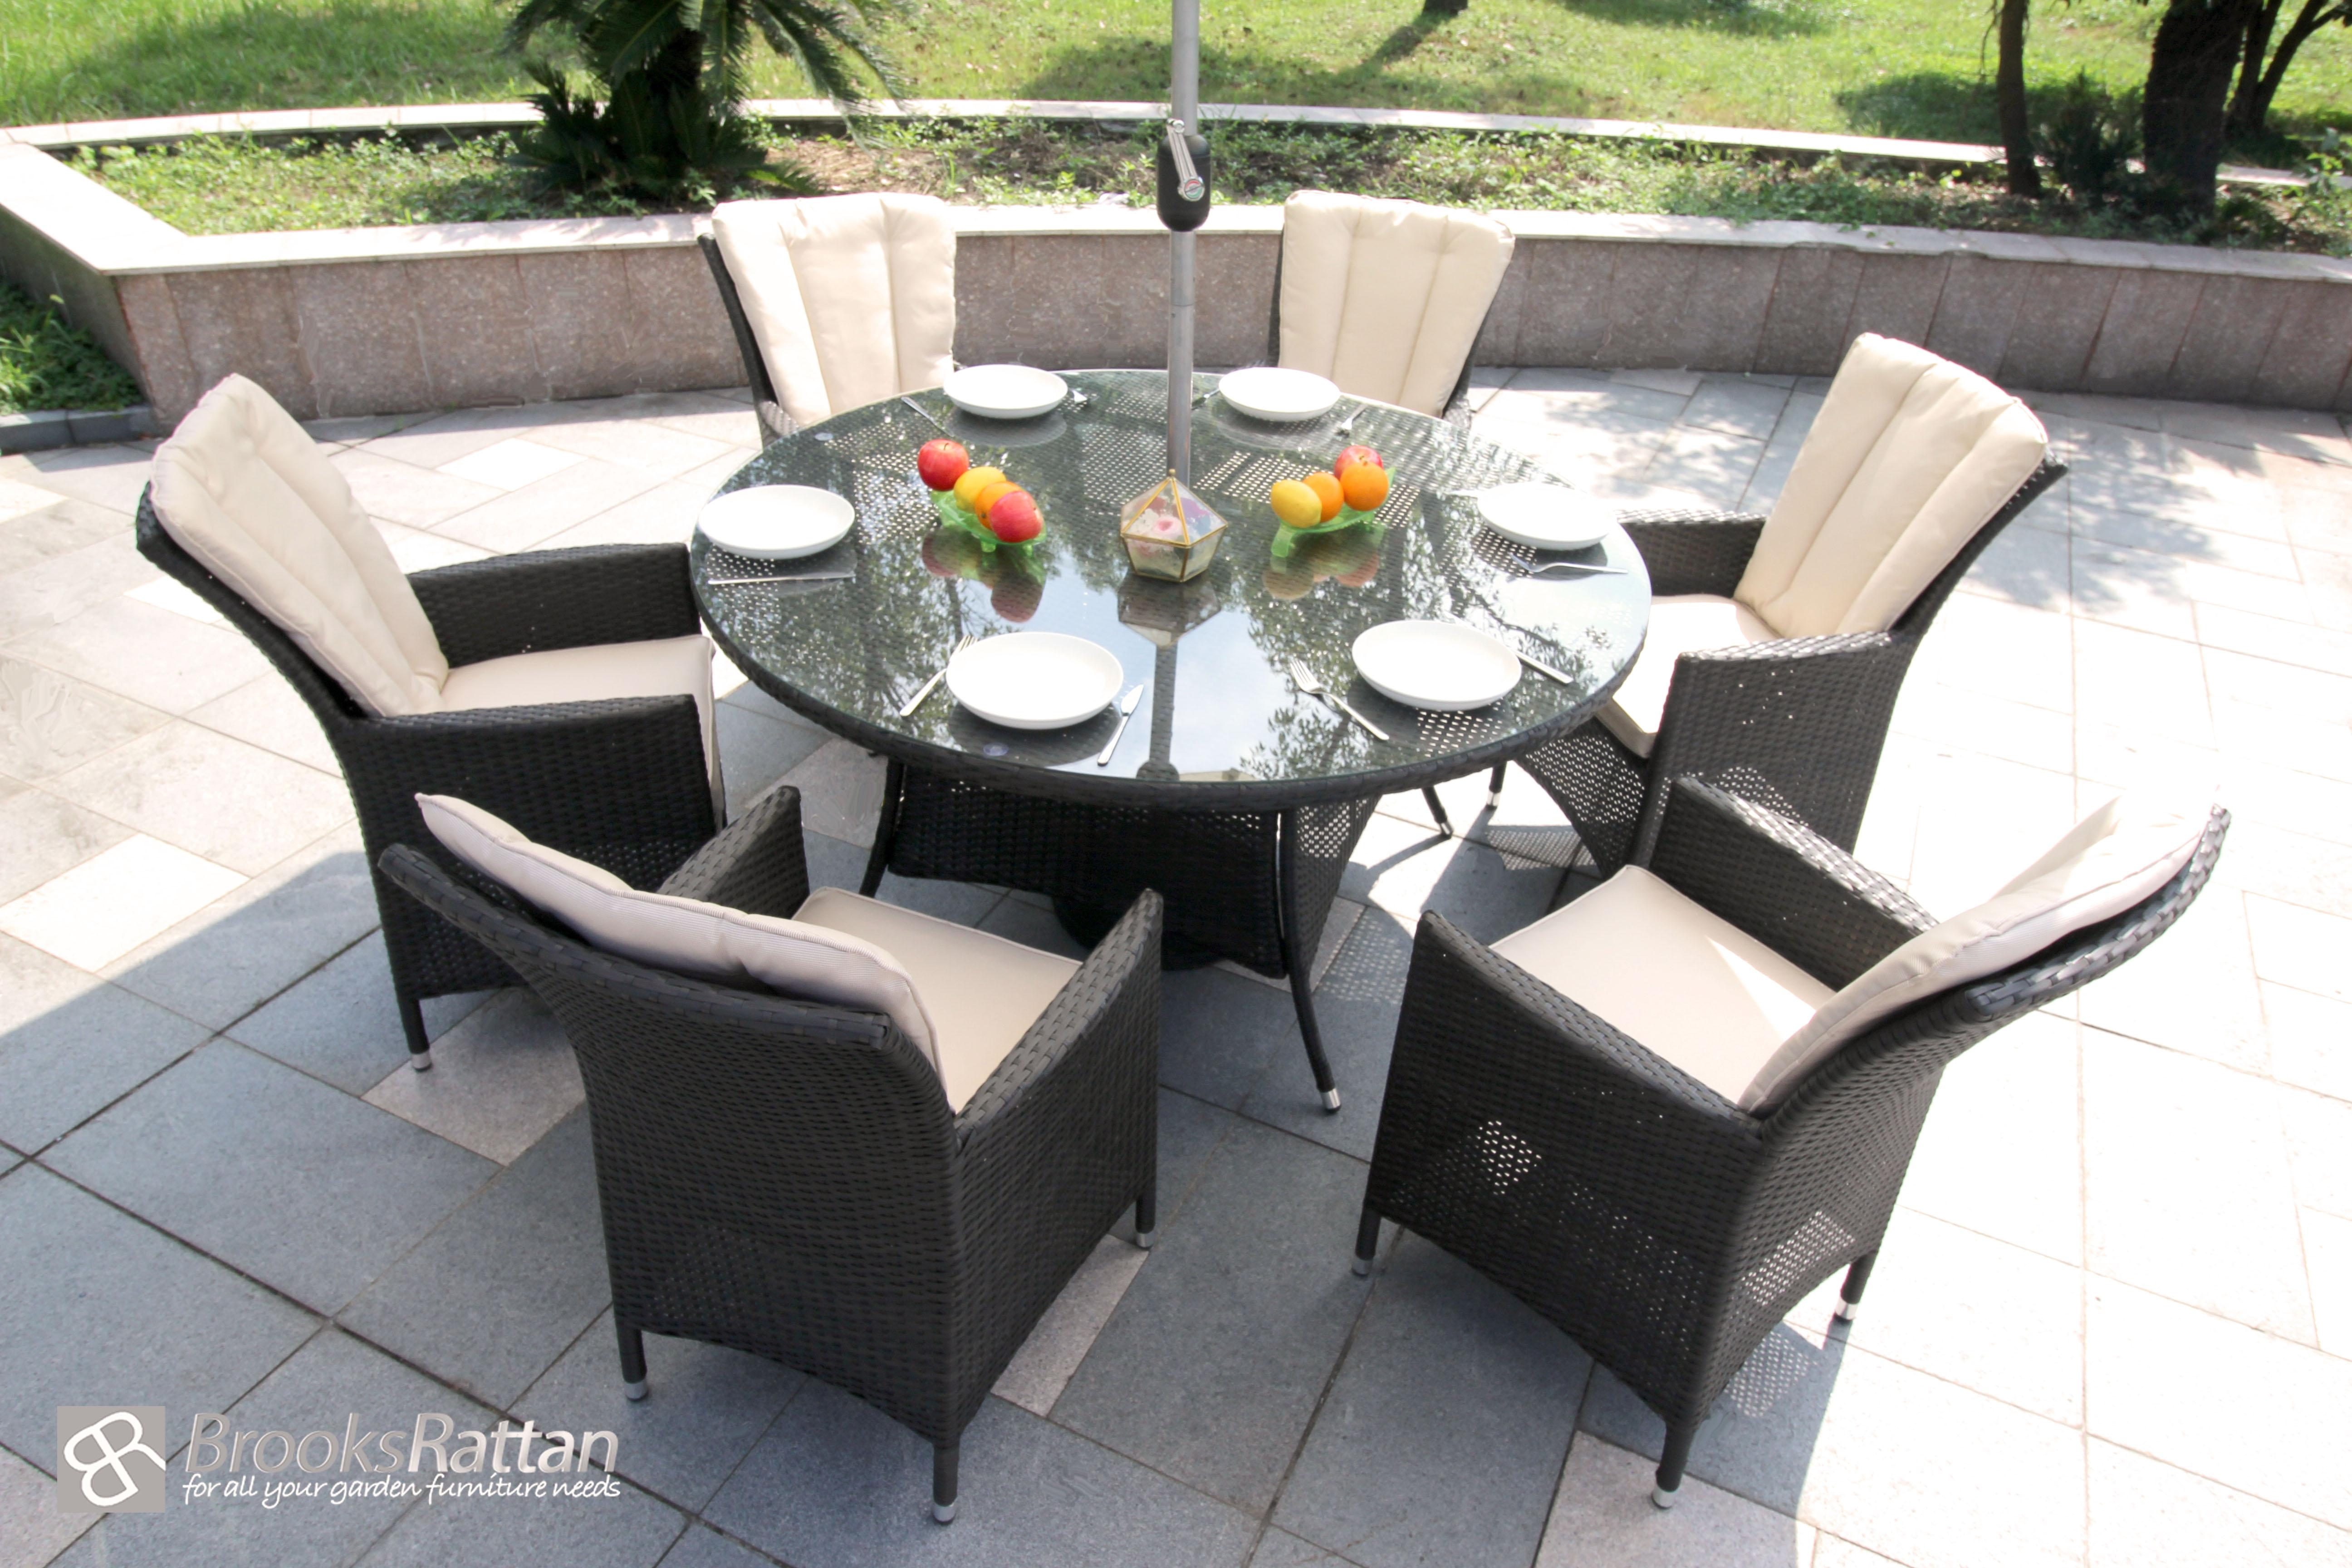 Rattan Garden Furniture Dining Sets Best Quality Rattan inside sizing 5184 X 3456